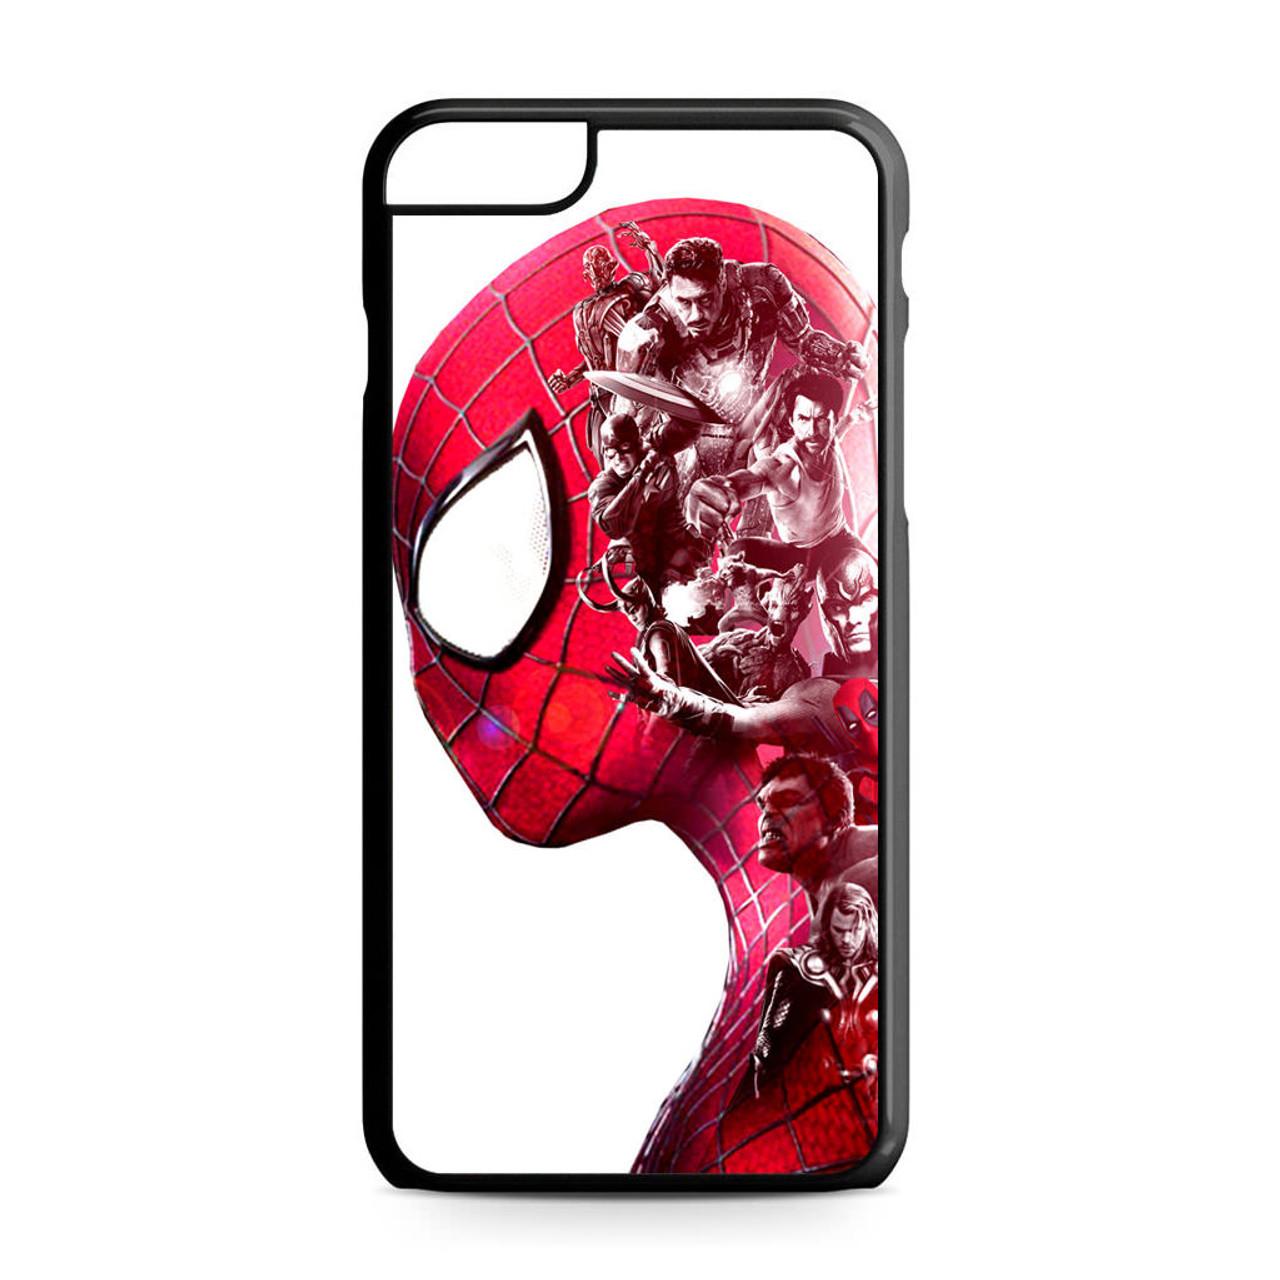 new product afdfa bfbbd Spiderman Superheroes Marvel iPhone 6 Plus/6S Plus Case